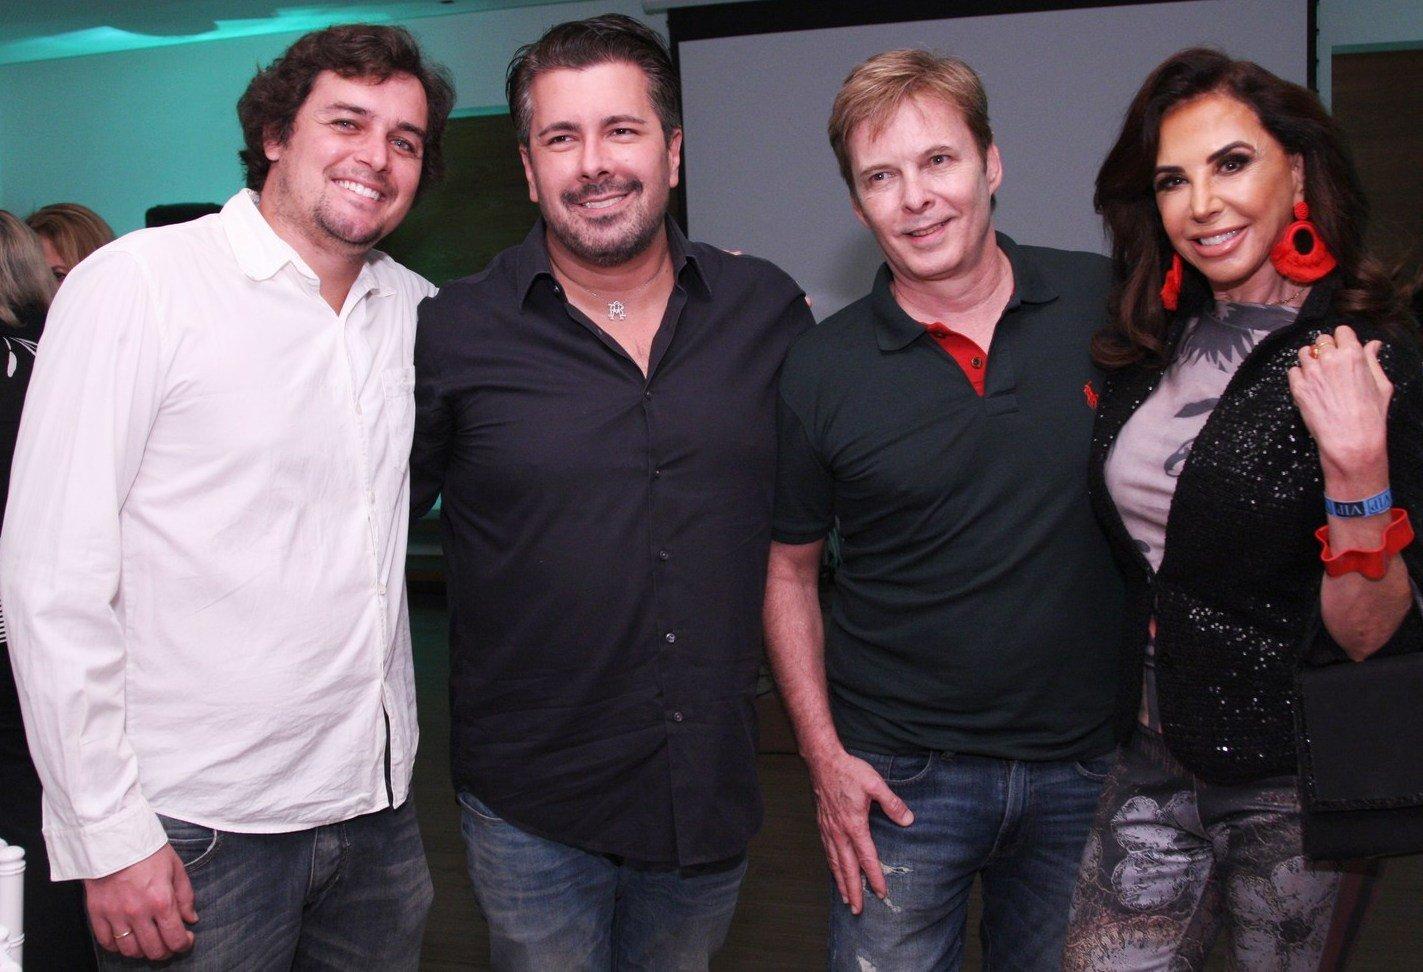 Felipe Dylon, André Ramos, Luiz Fernando Priolli e Claudia Alencar  - Fotos: Vera Donato